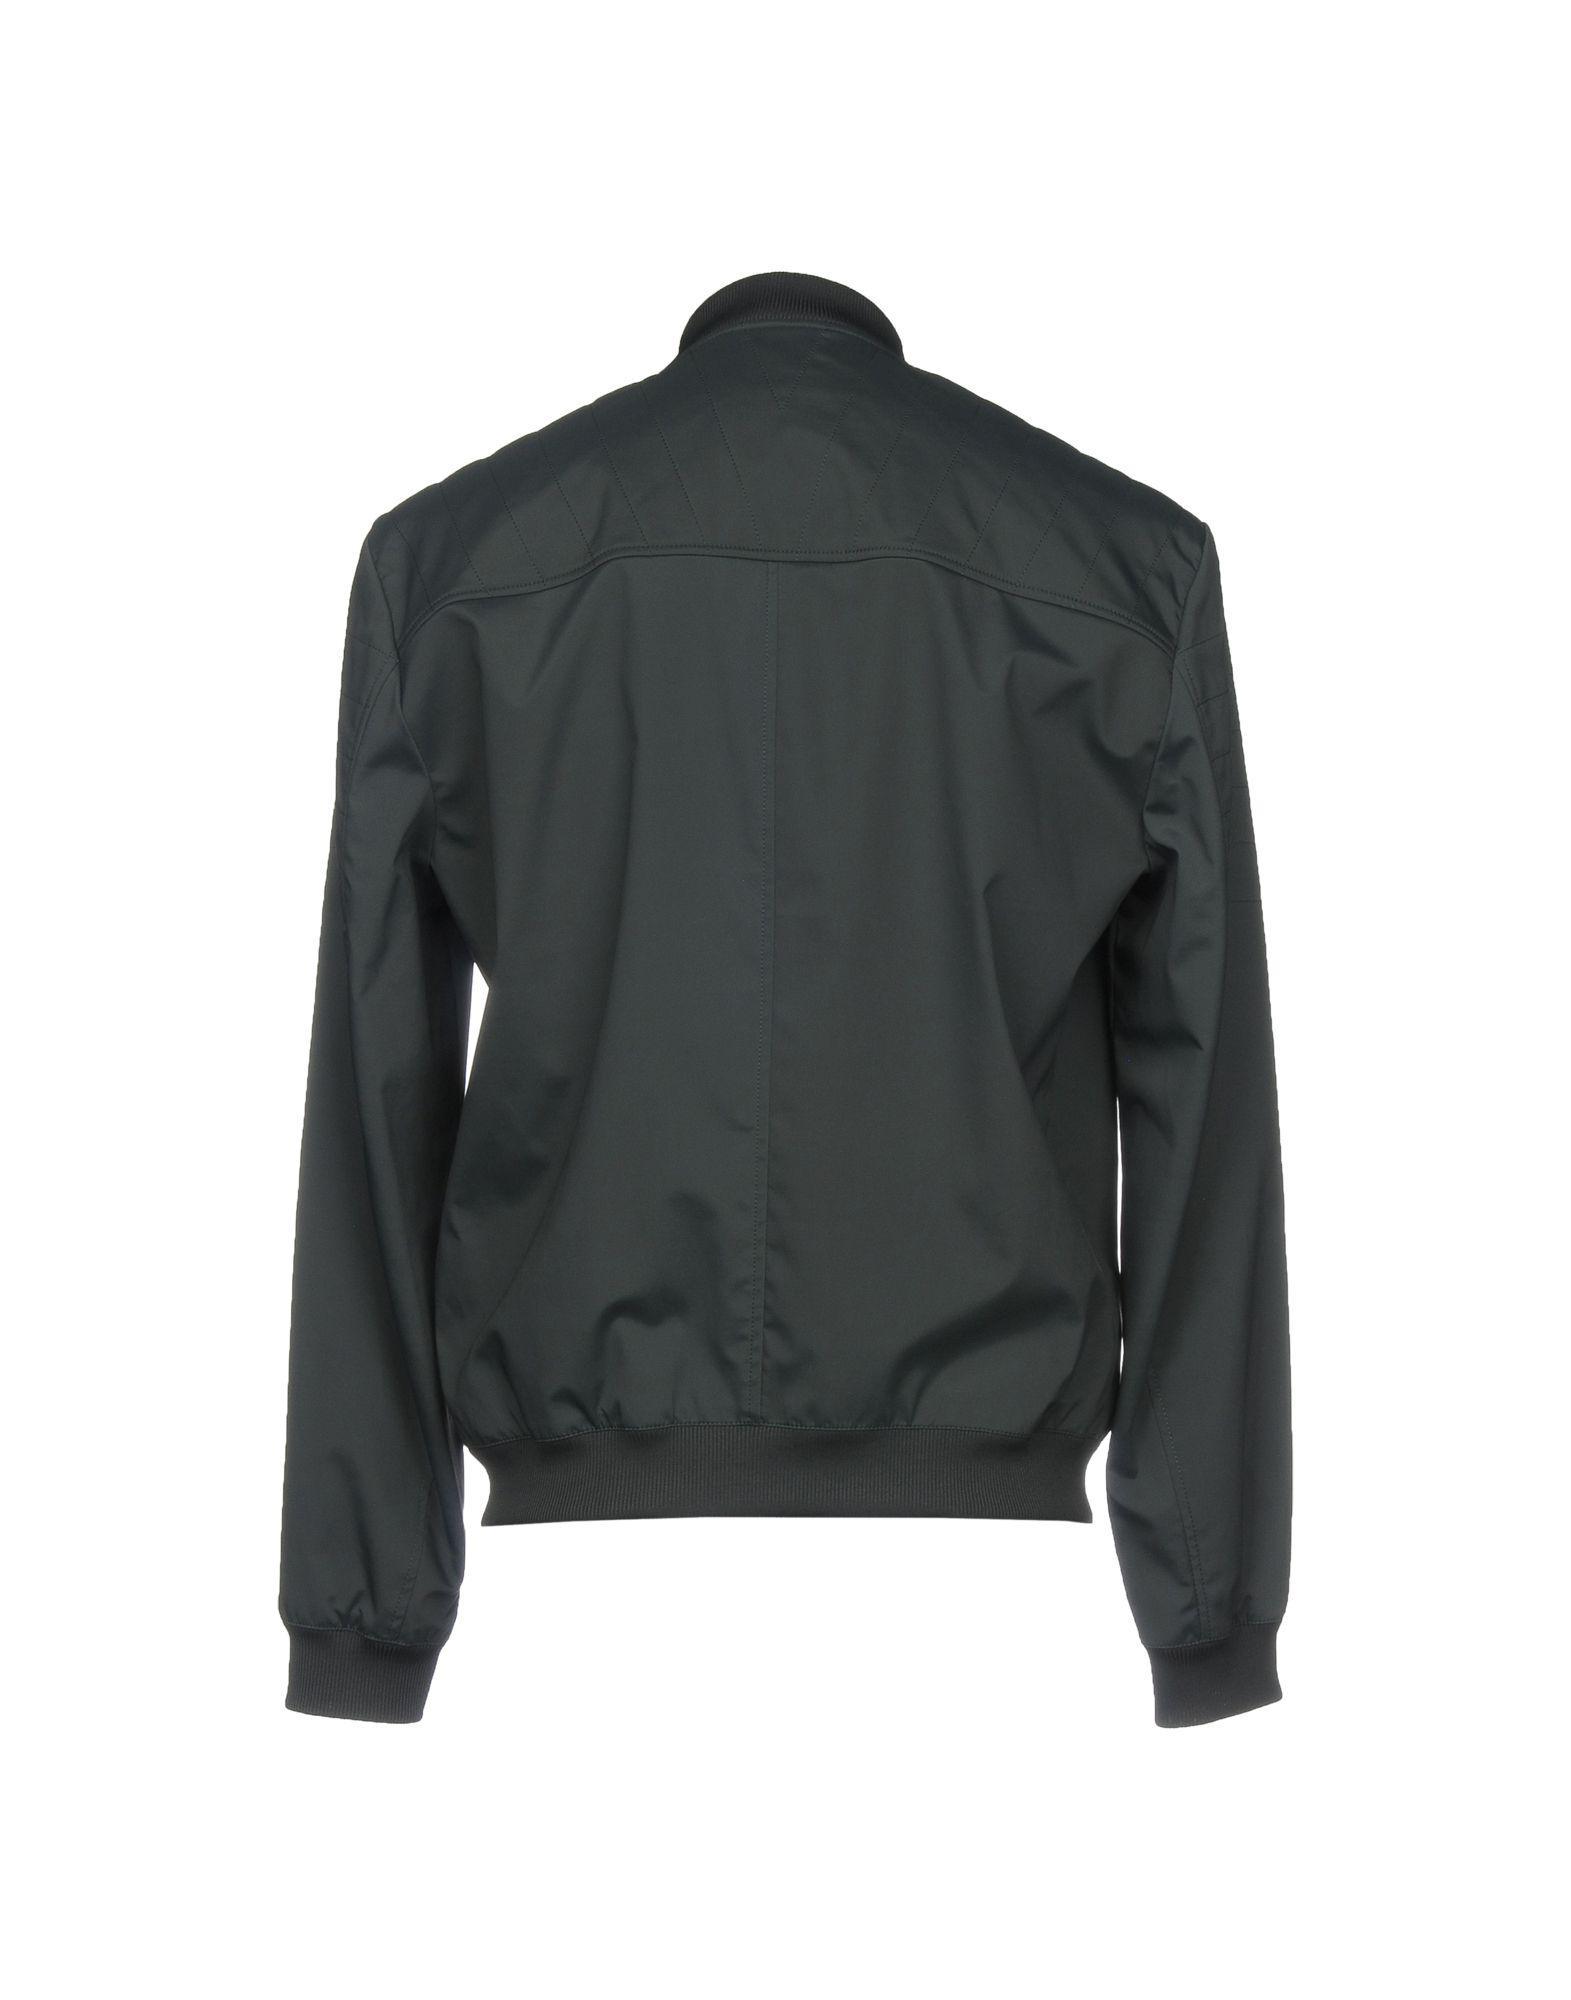 Versace Synthetic Jackets in Dark Green (Green) for Men